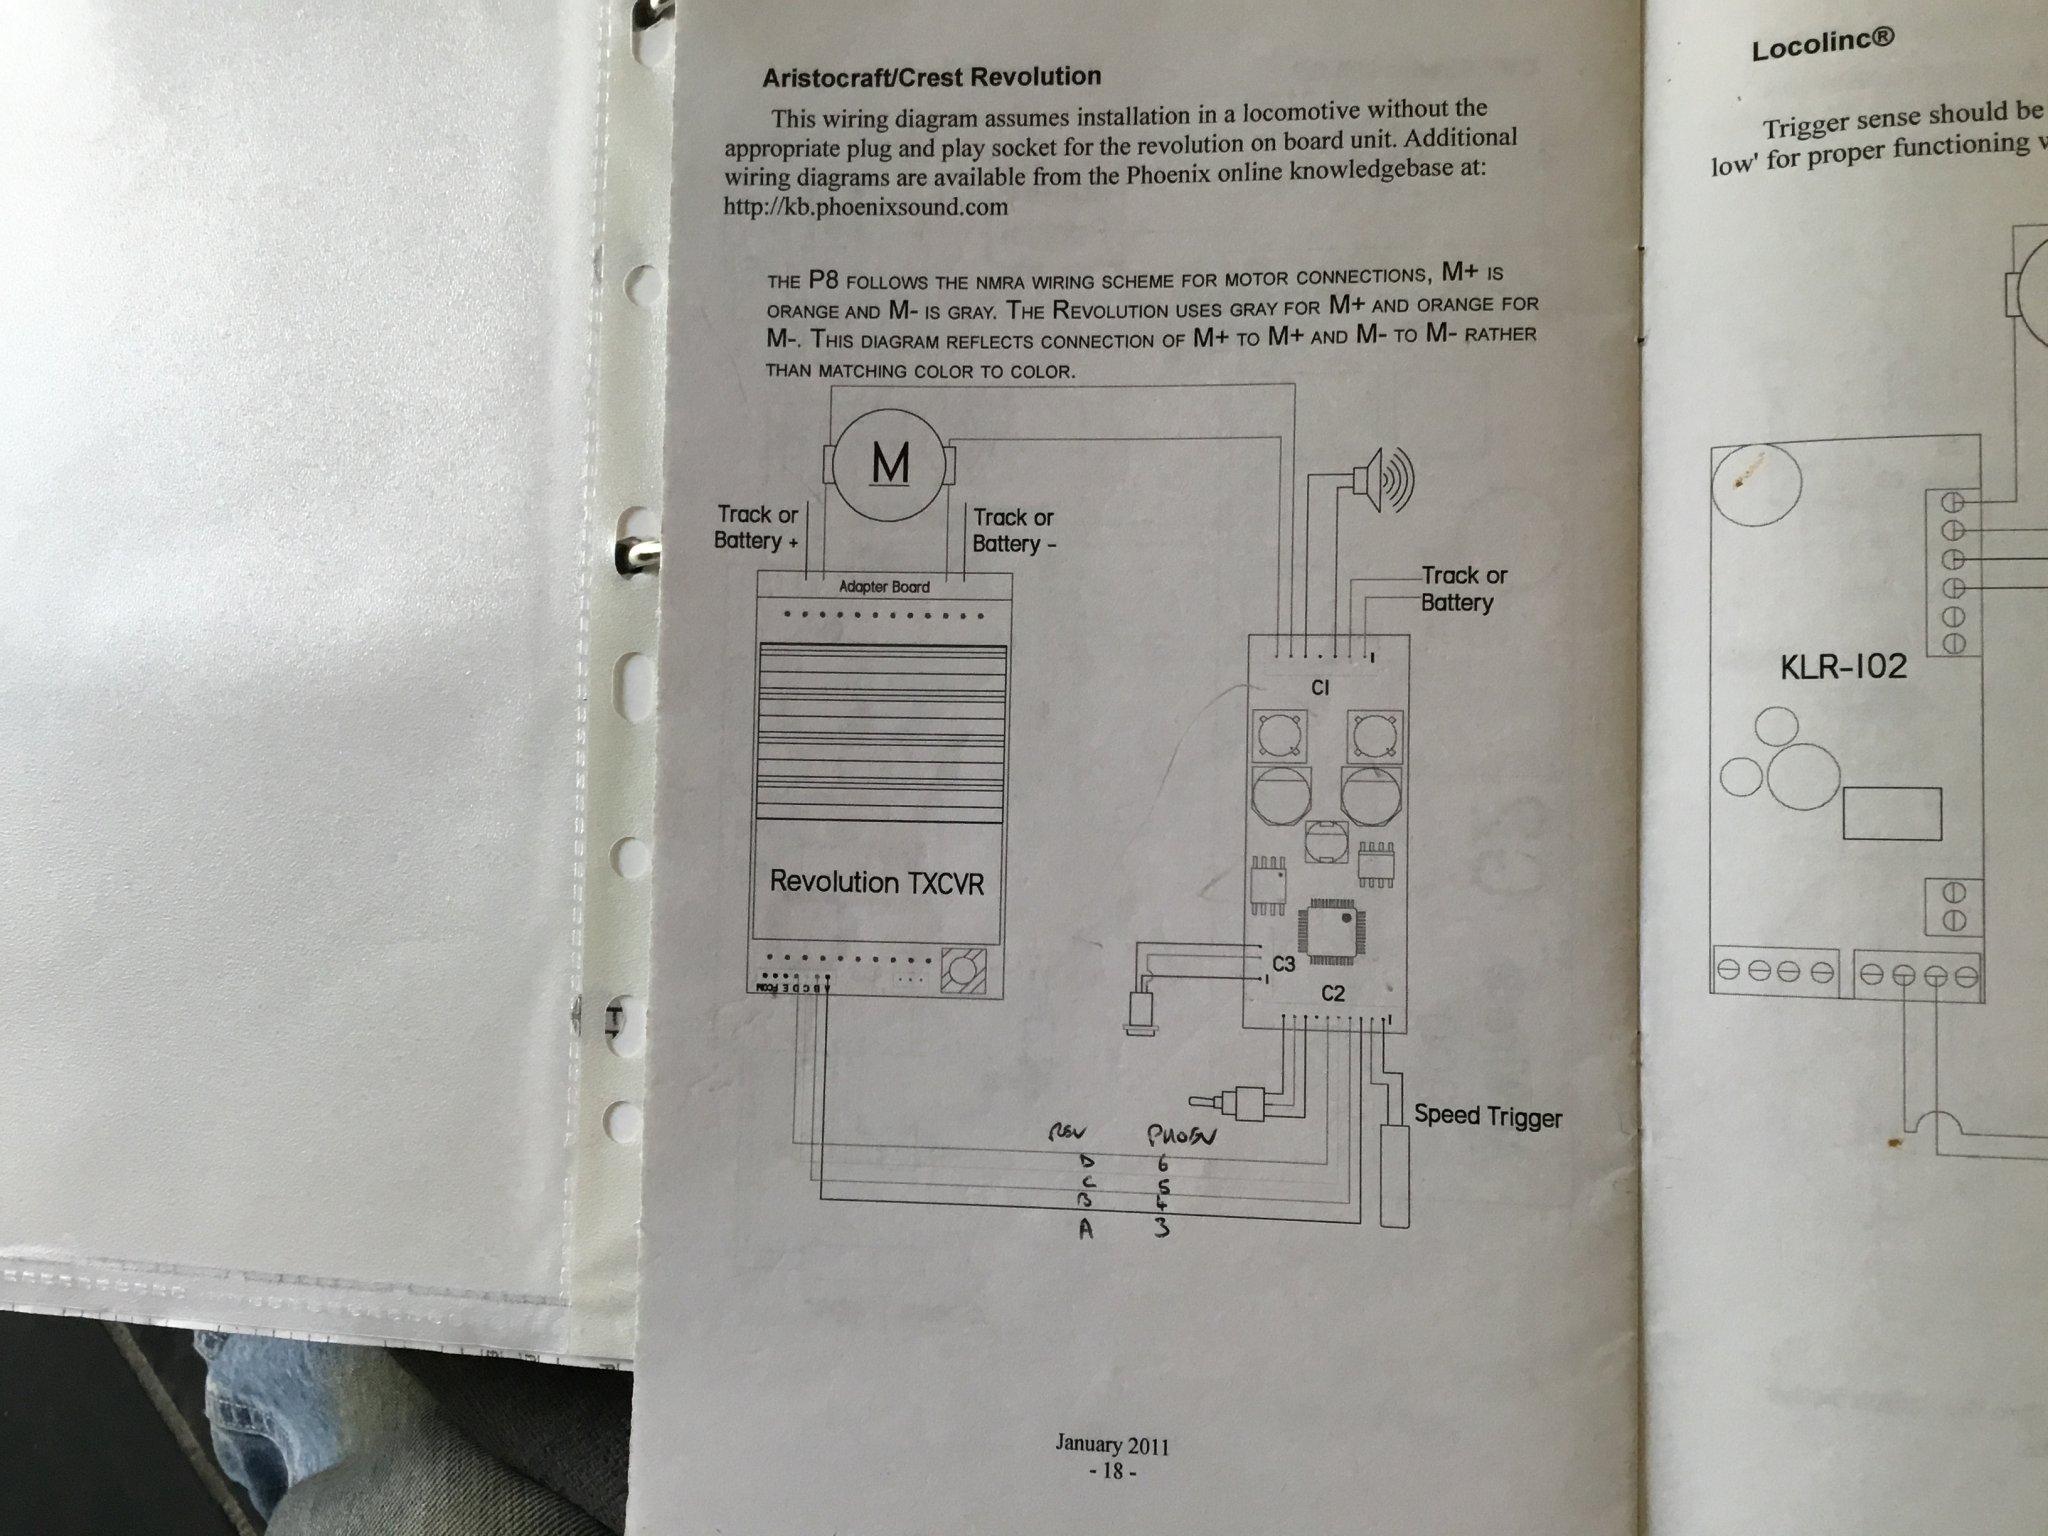 36C6A281-82A5-448C-8E7A-607BF46606B2.jpeg